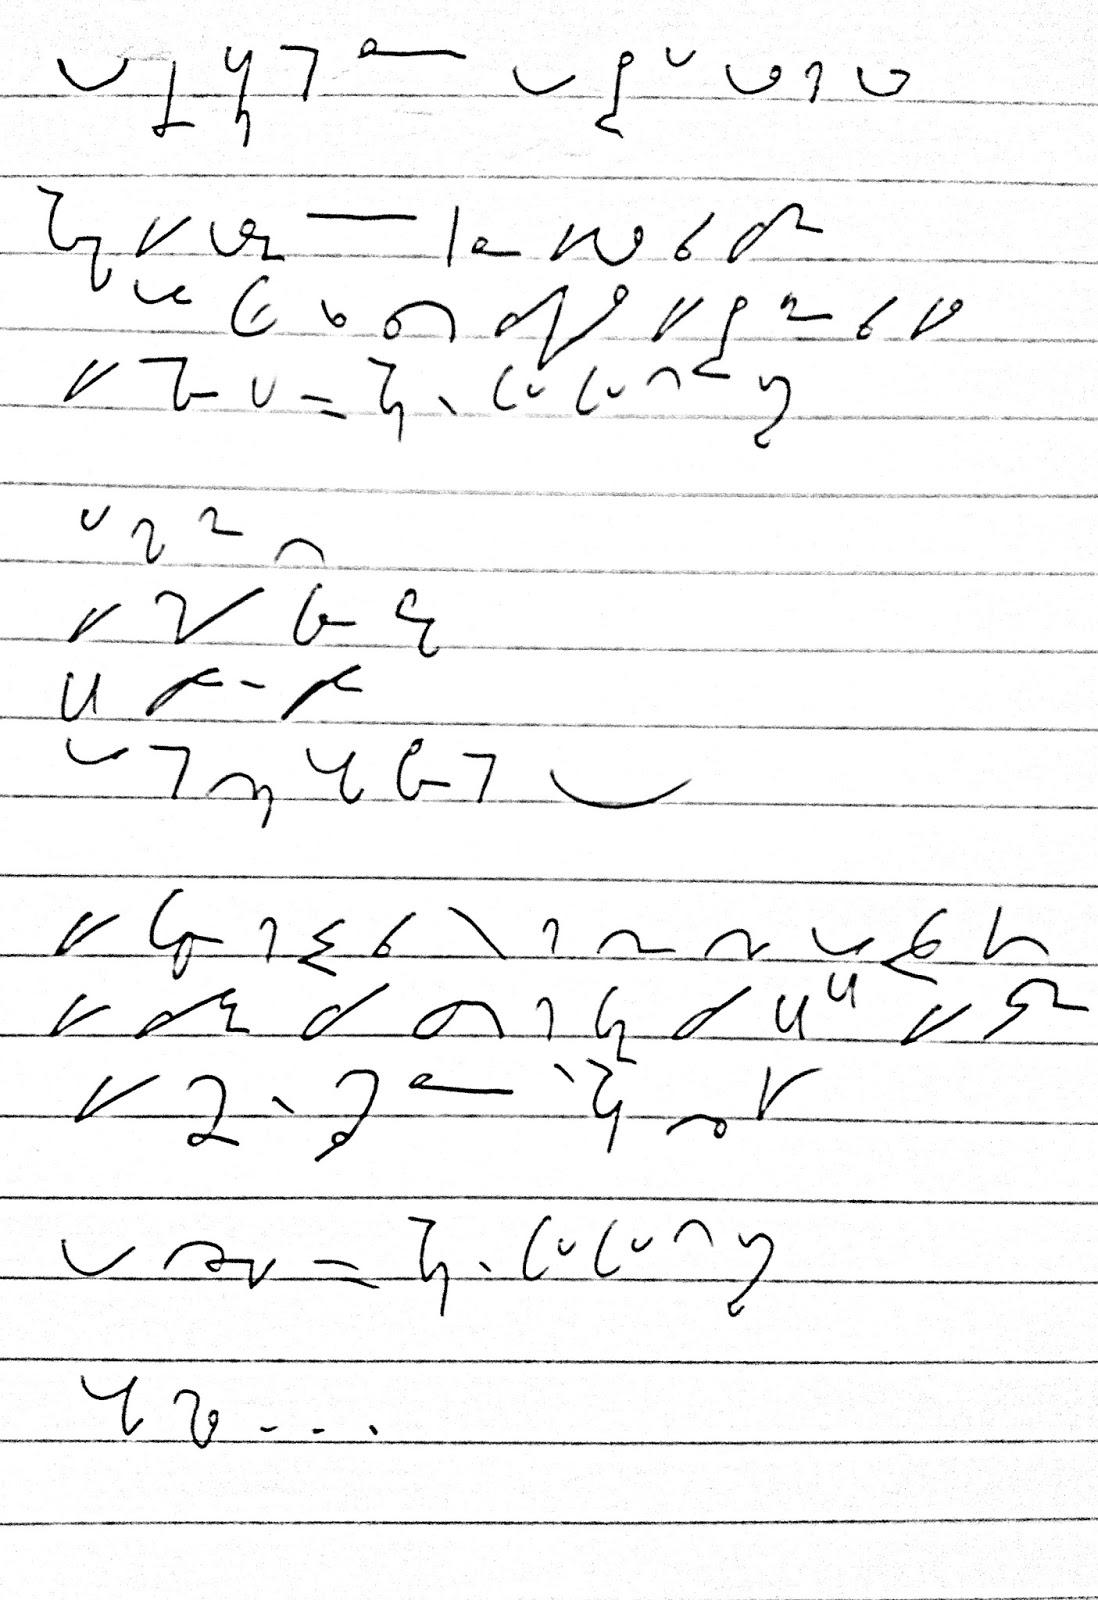 how to learn teeline shorthand